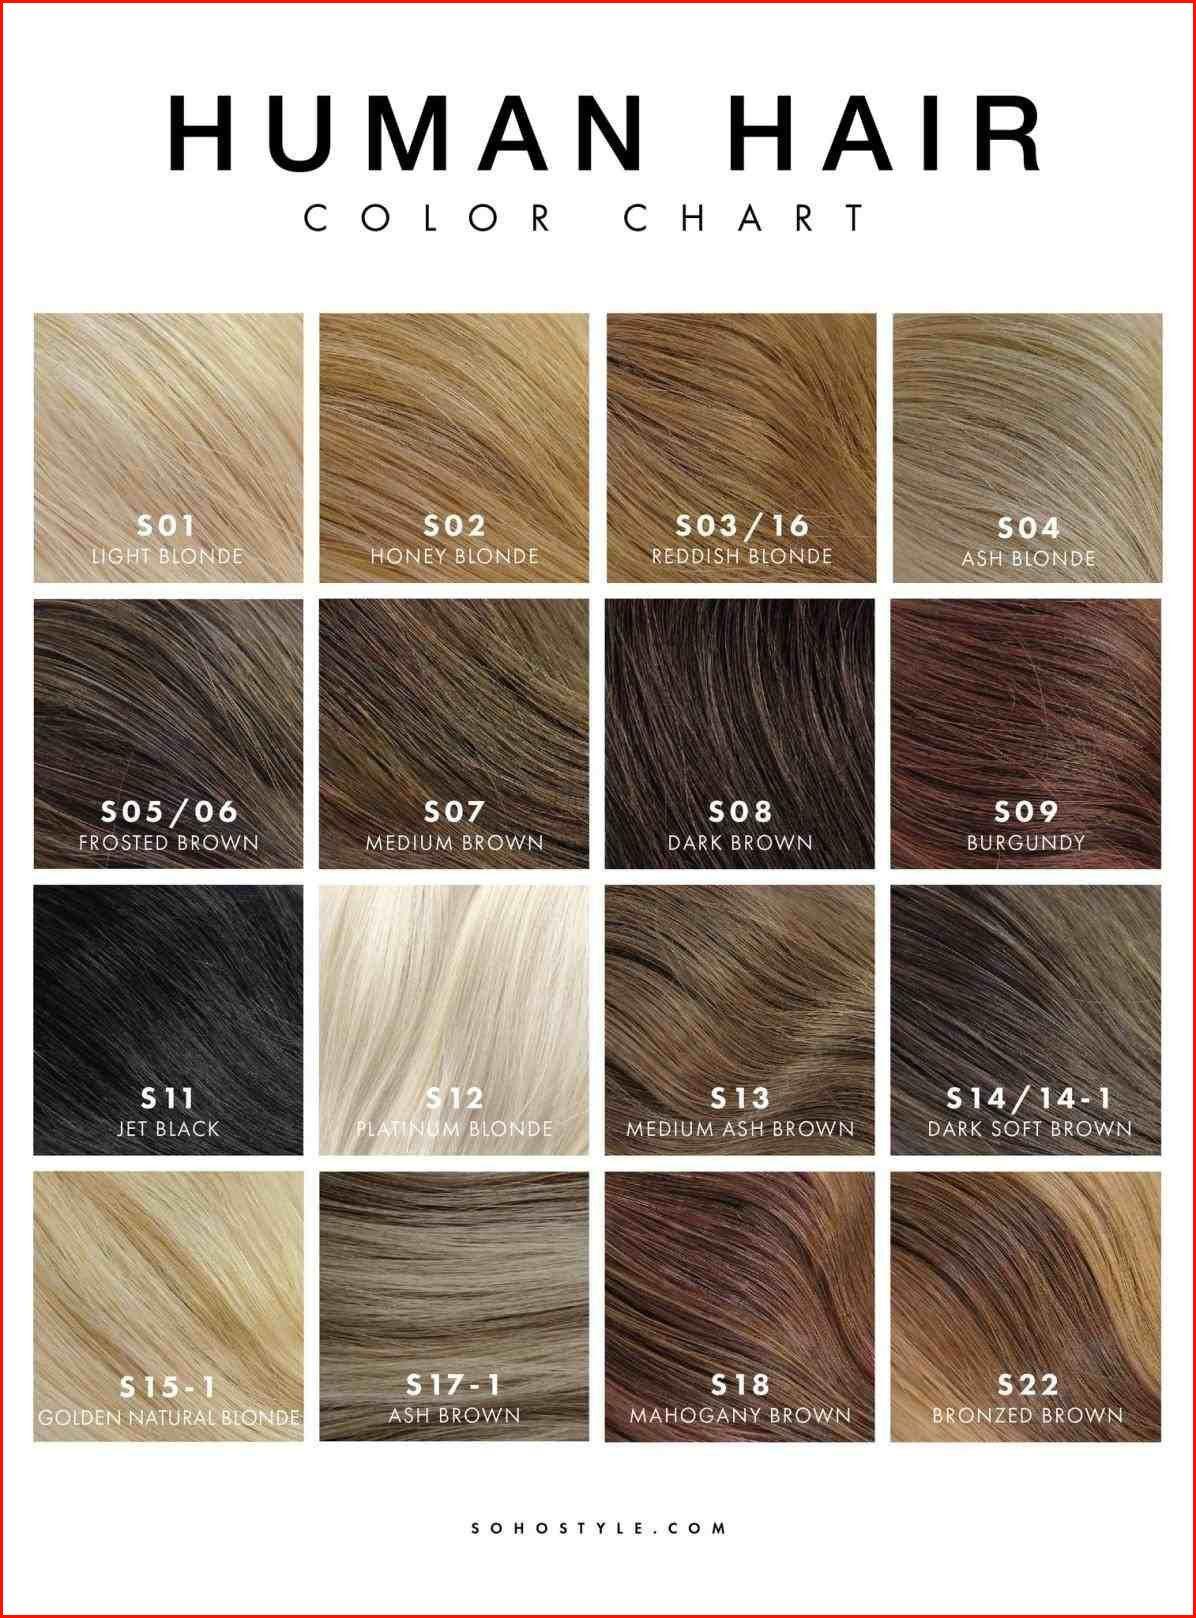 Cool Light Golden Brown Hair Color Chart Photos Of Hair Color Ideas Di 2021 Ide Warna Rambut Warna Rambut Pirang Warna Pewarna Rambut